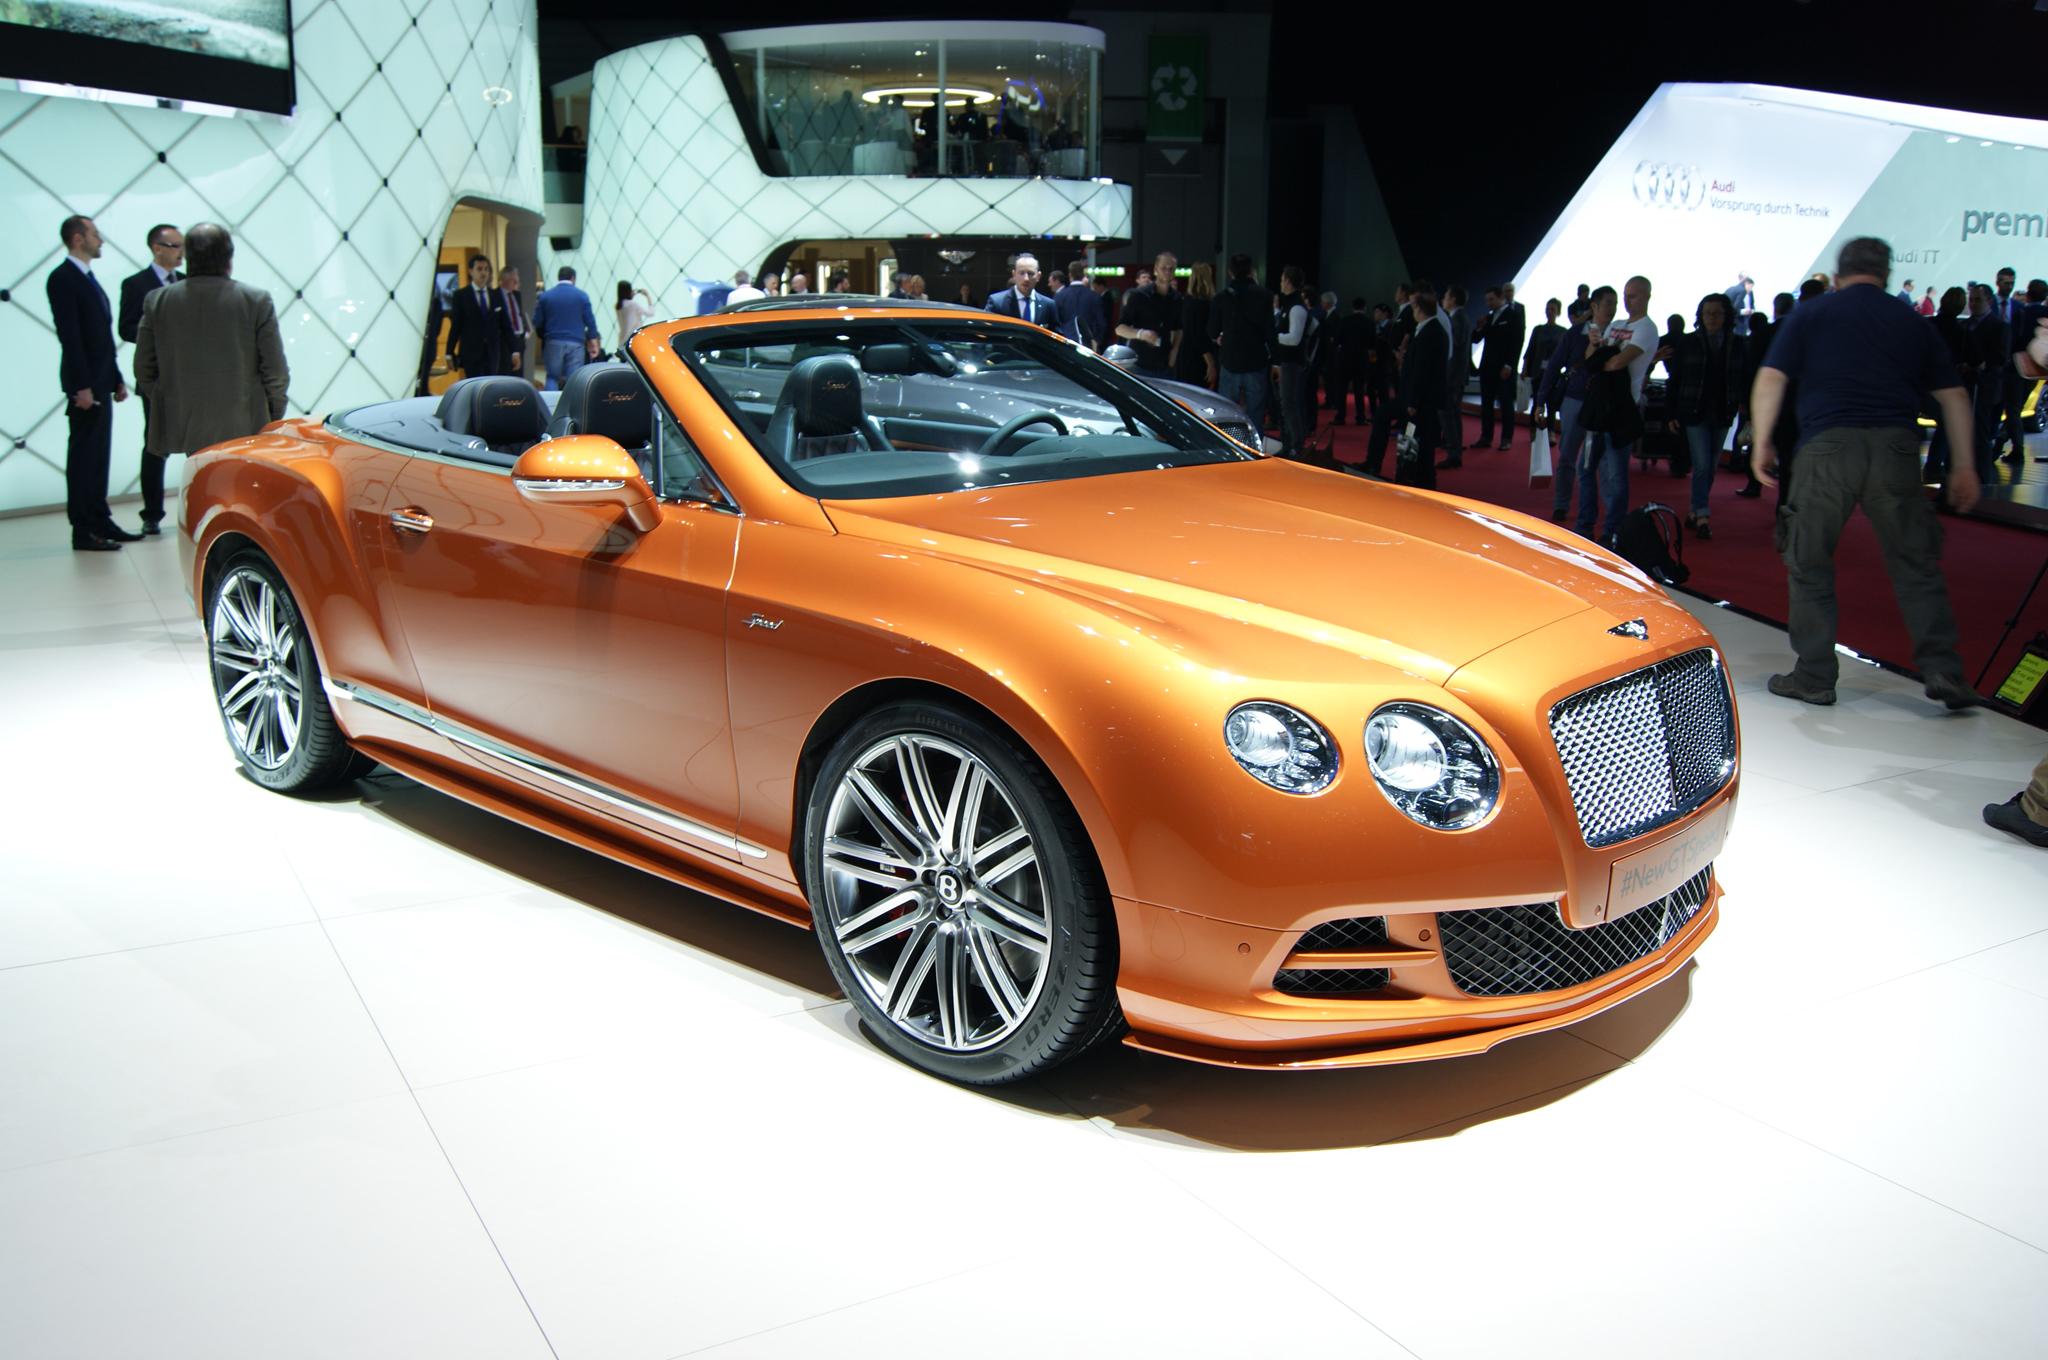 2015 Bentley Continental Gt Image 10